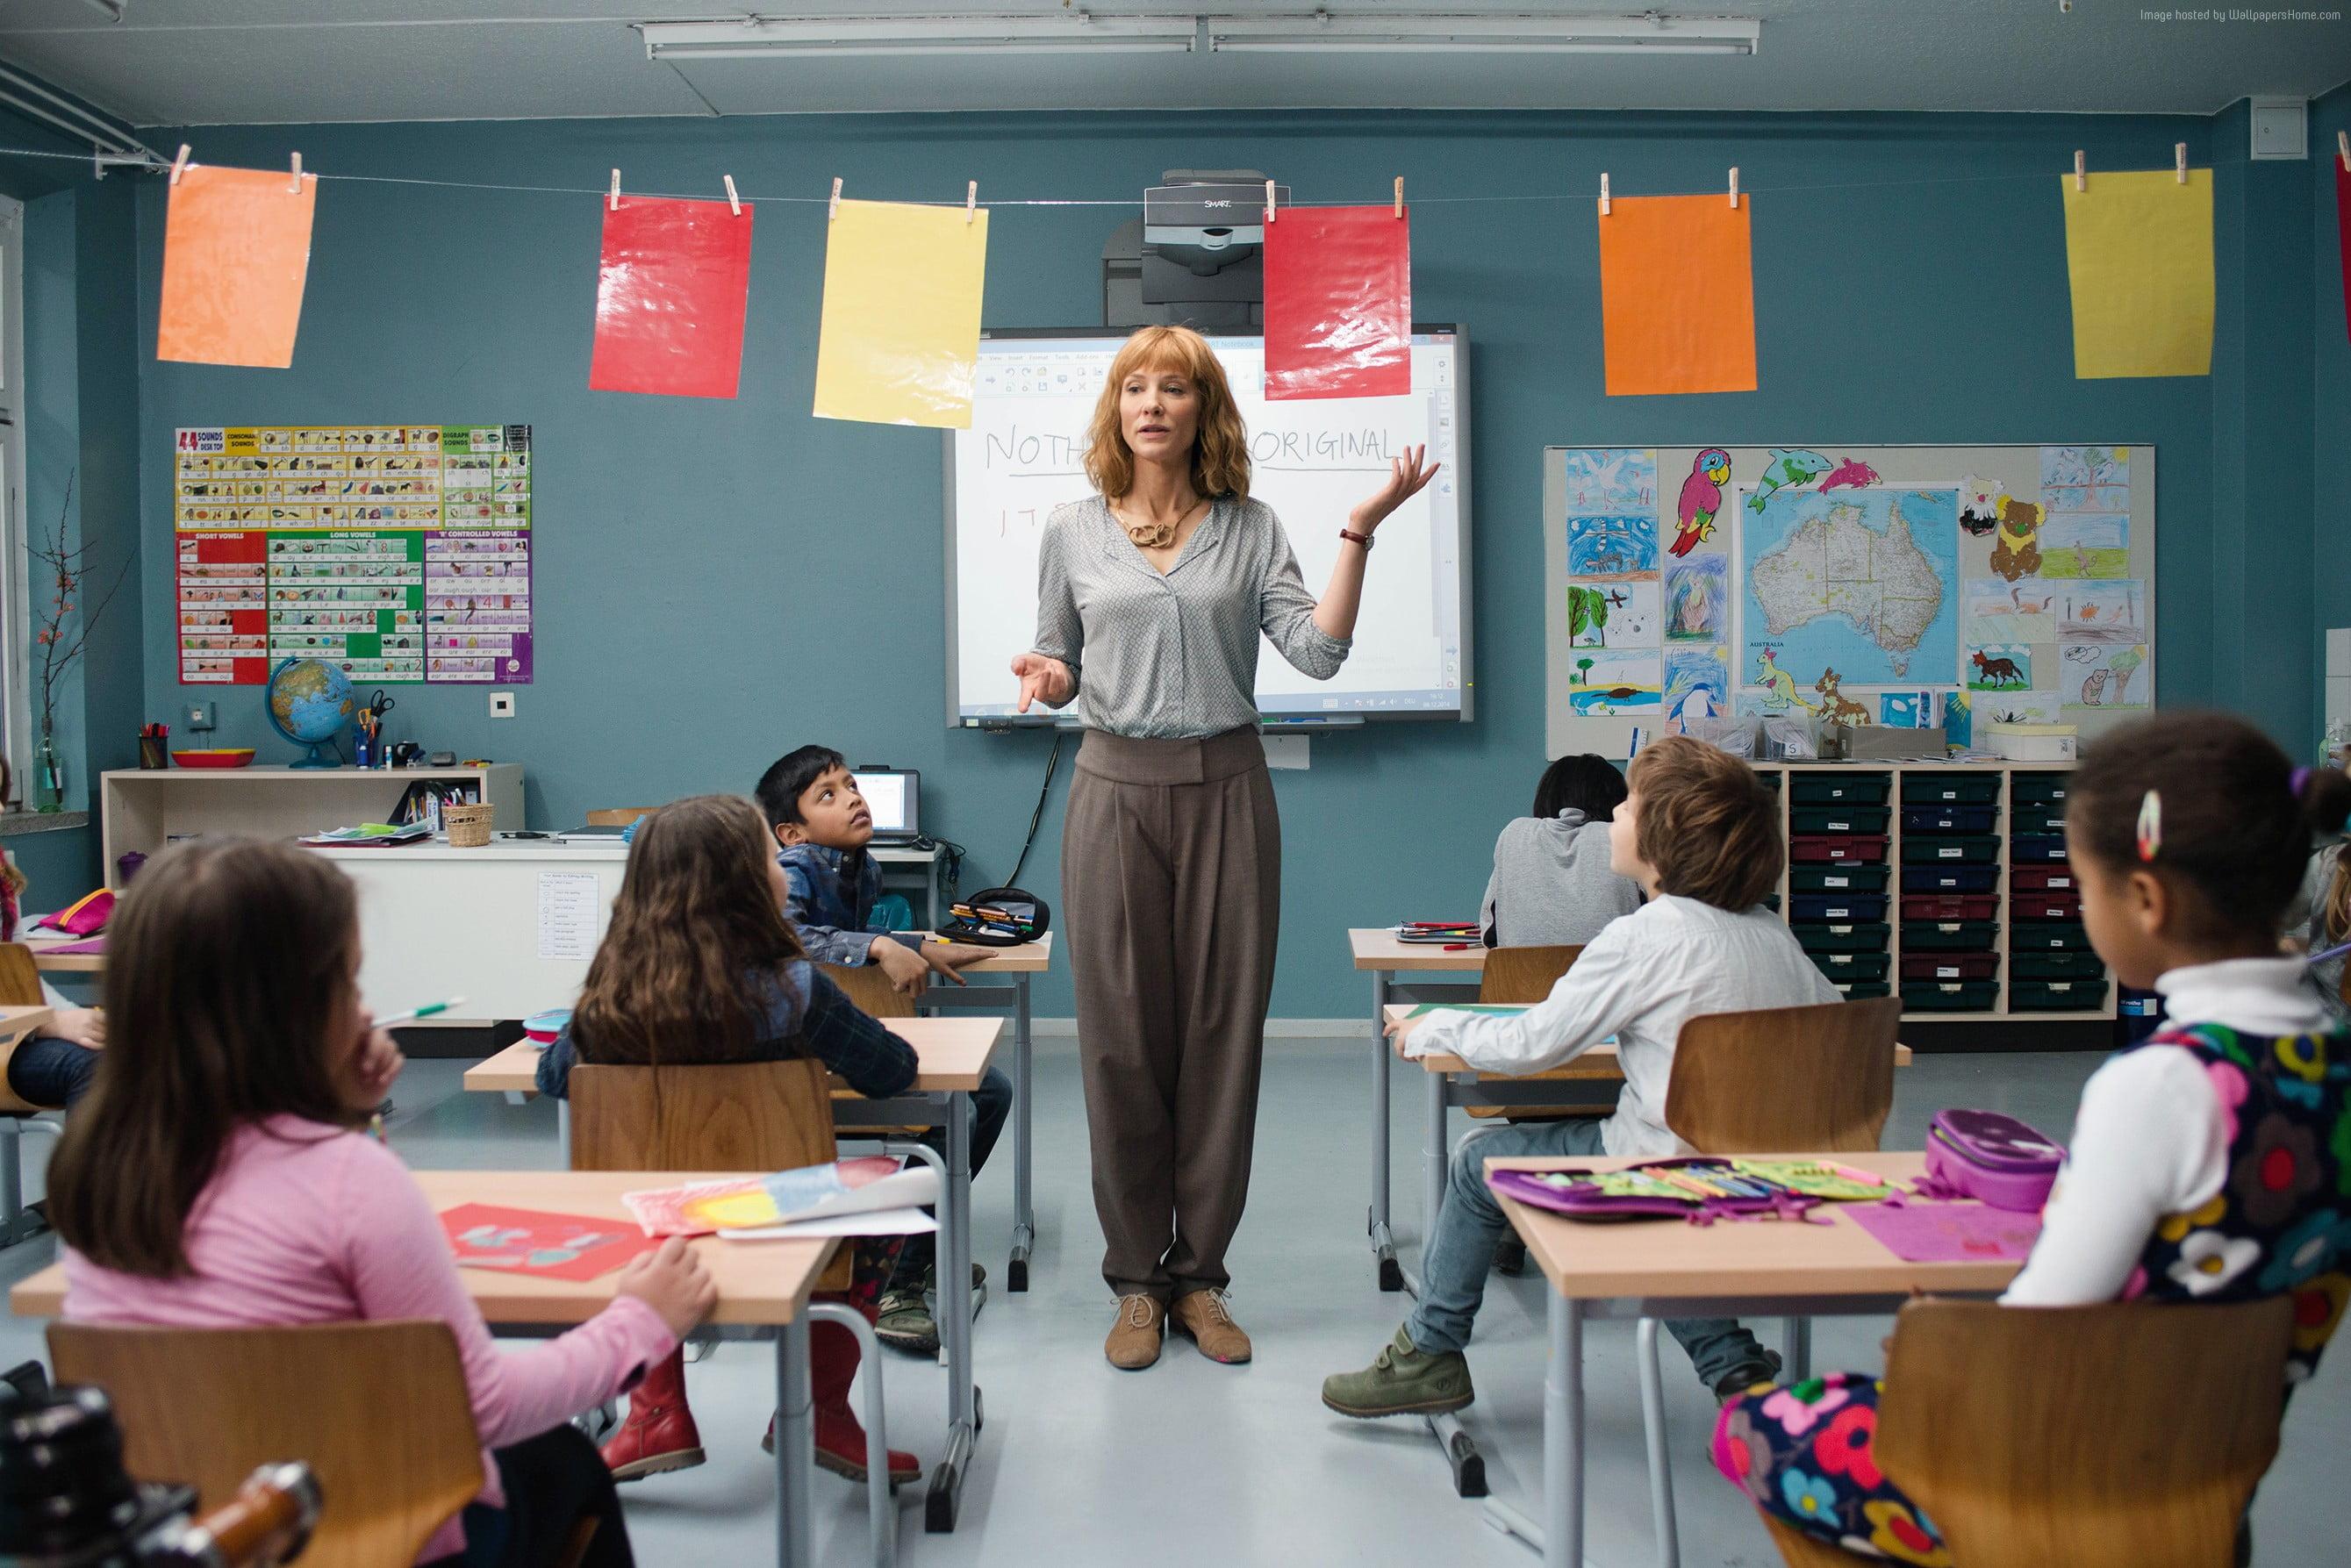 1080p Iphone 7 Plus Wallpaper Teacher Teaching Children Inside Classroom During Daytime